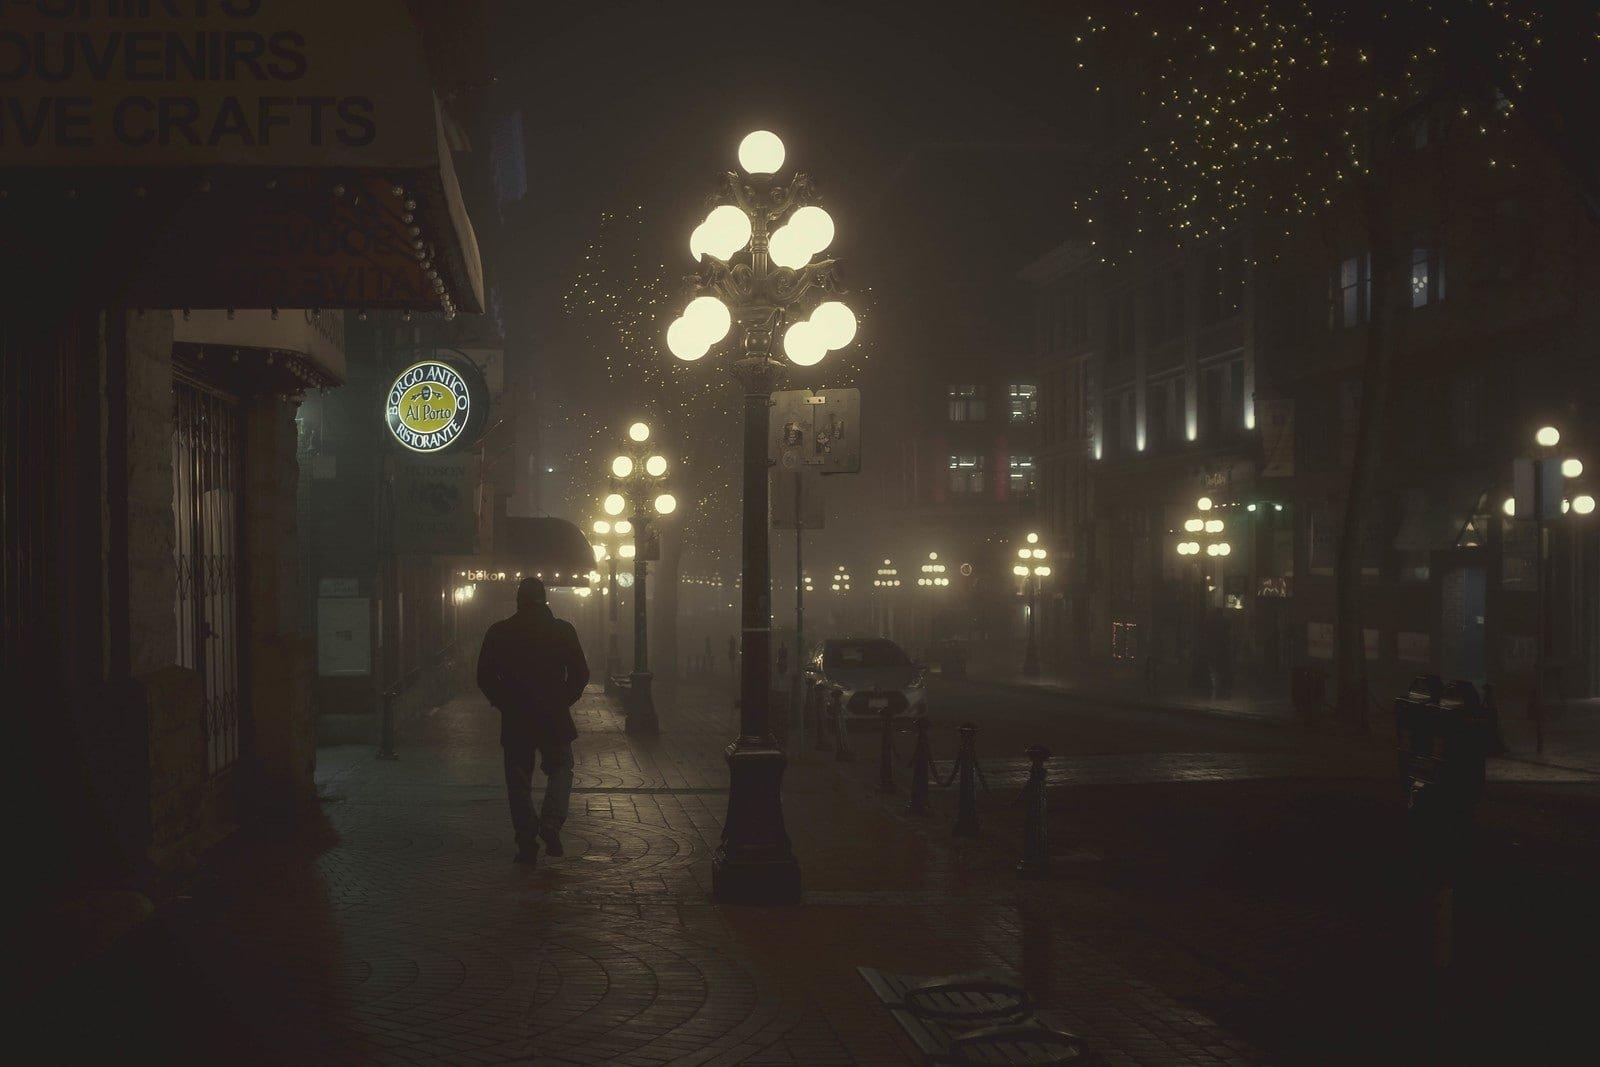 Foggy night in Gastown